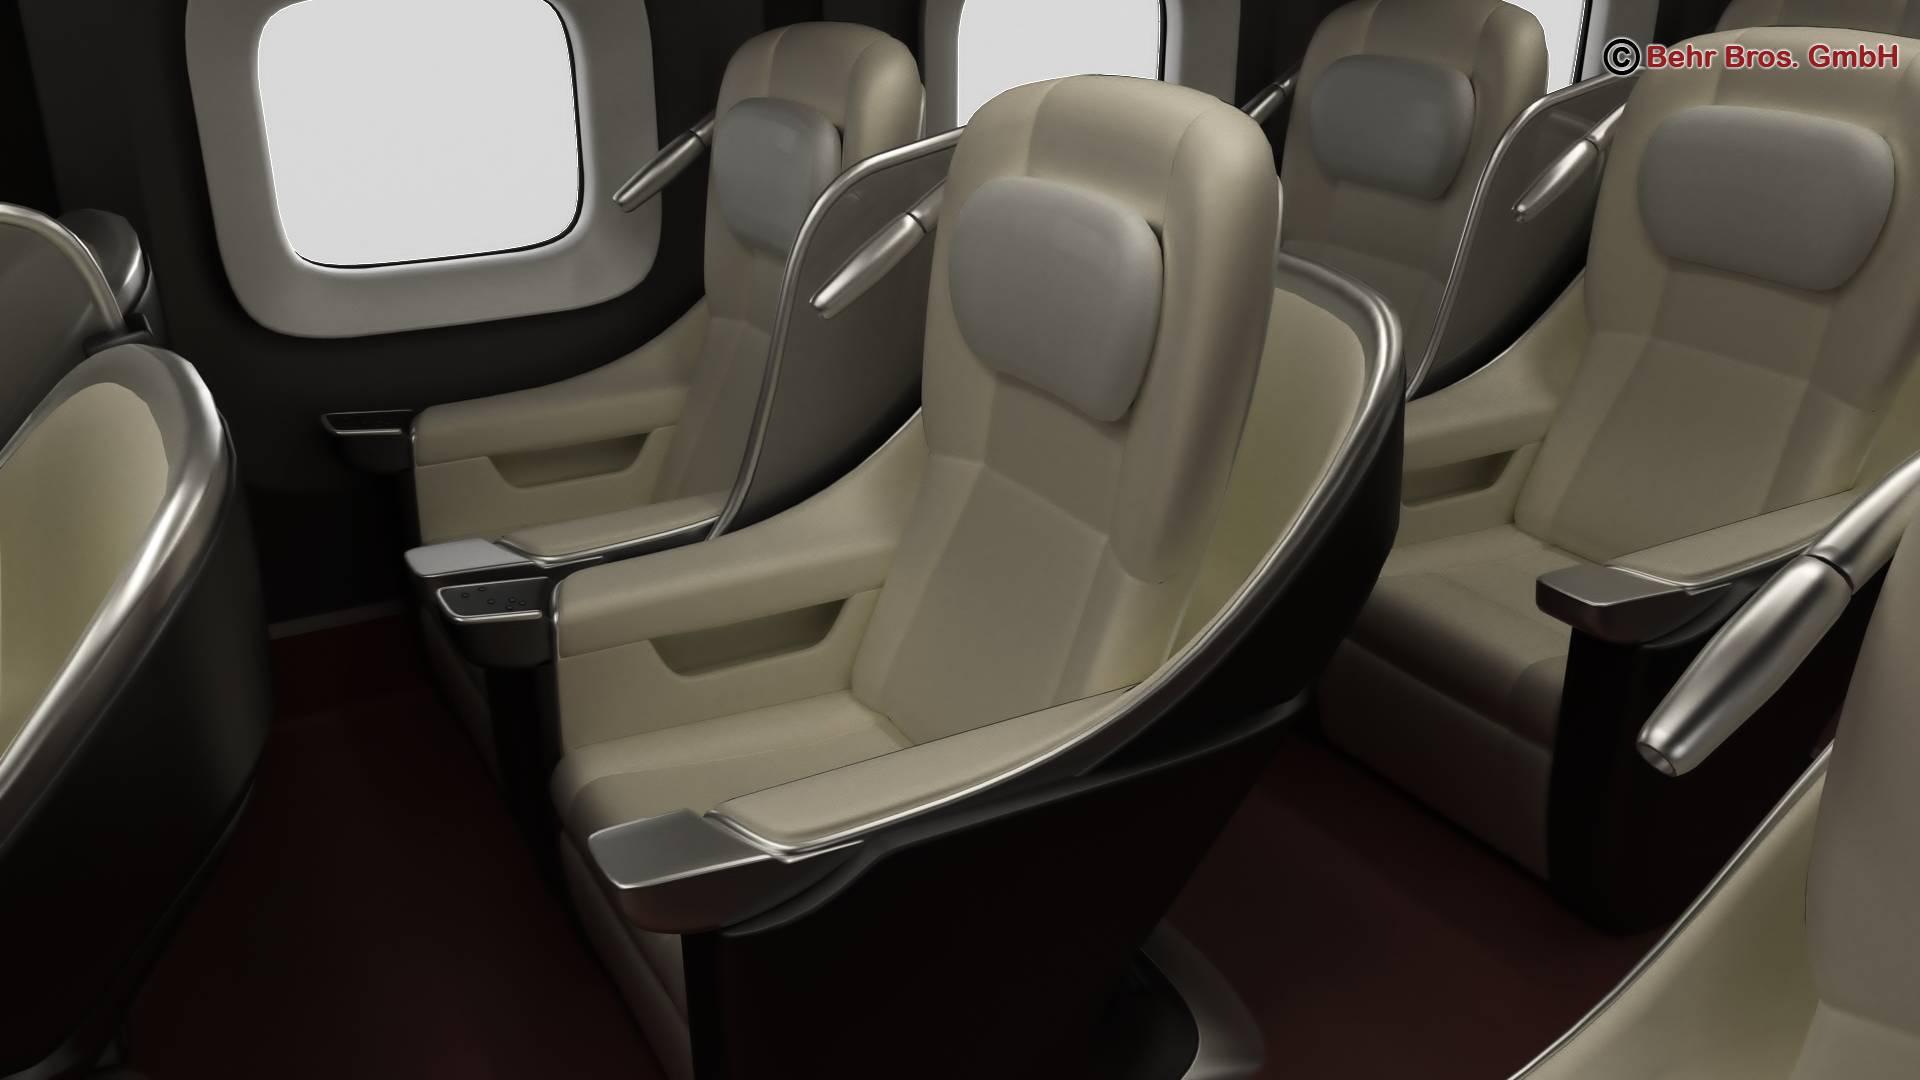 shinkansen e7 3d model 3ds max fbx c4d lwo ma mb obj 265665